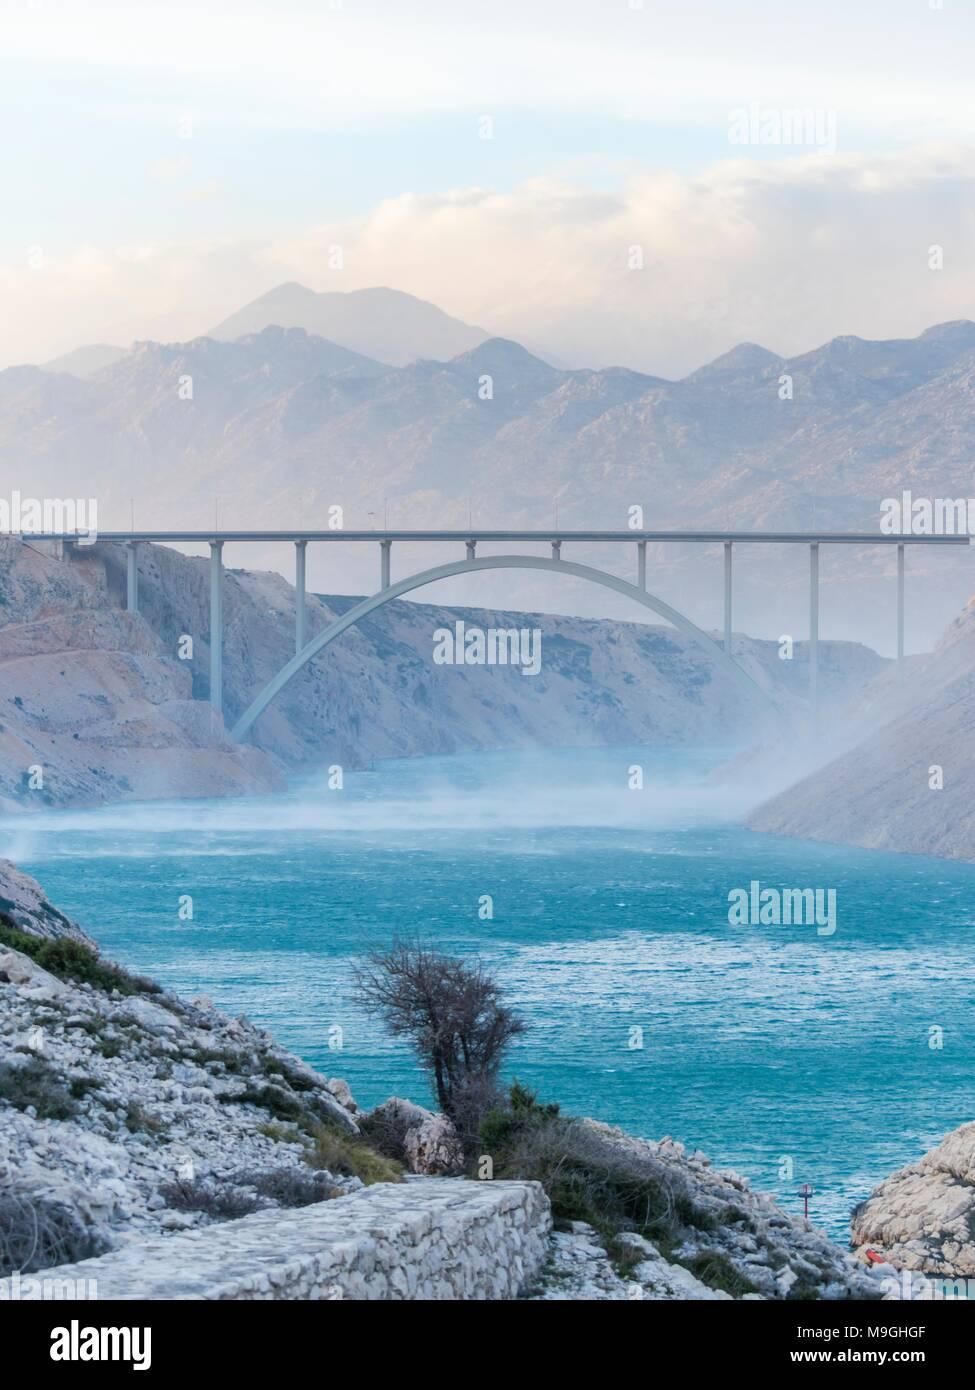 Maslenica bridge and bura wind - Stock Image